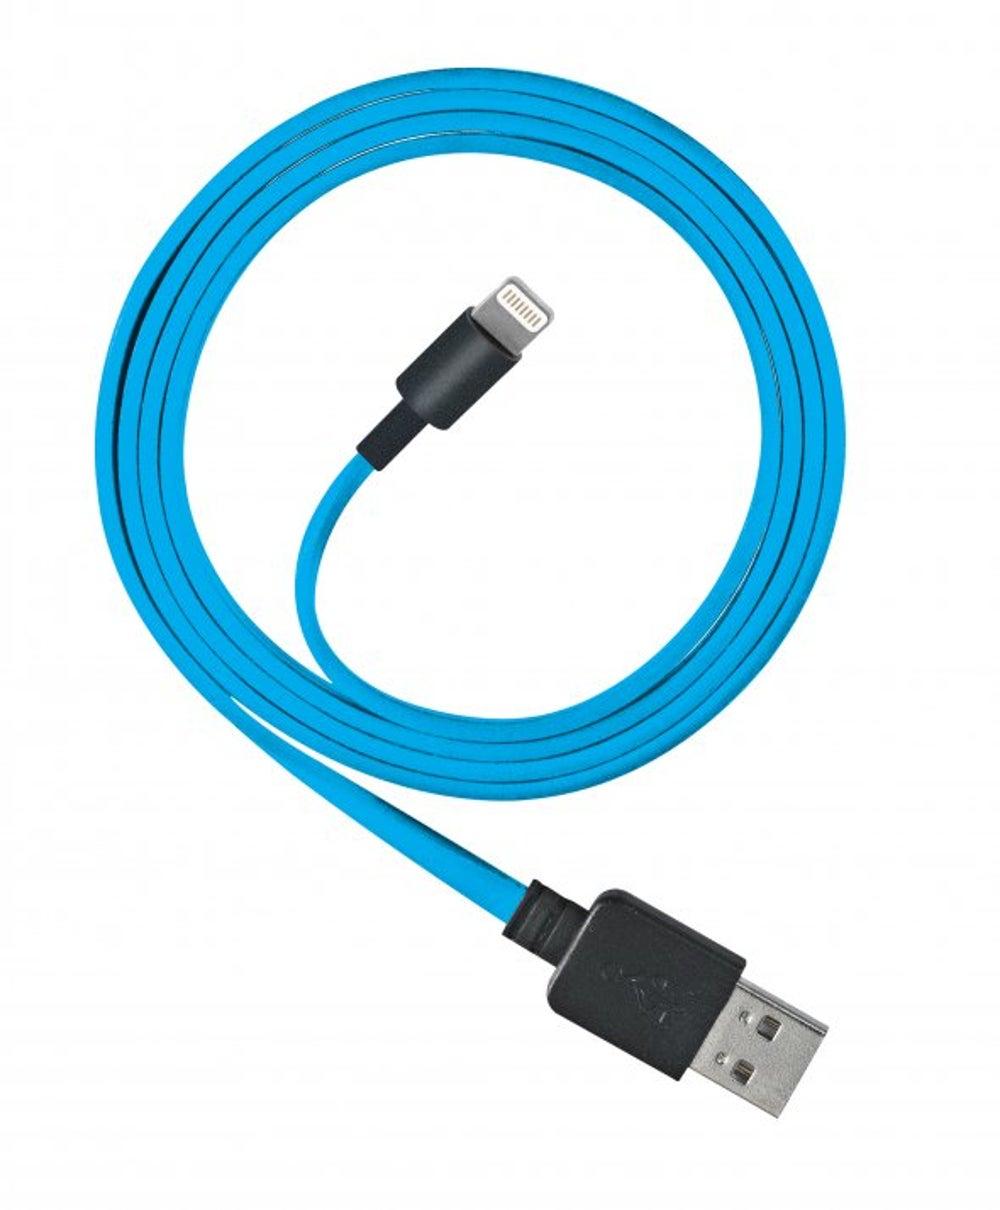 Ventev's Lightning cables.